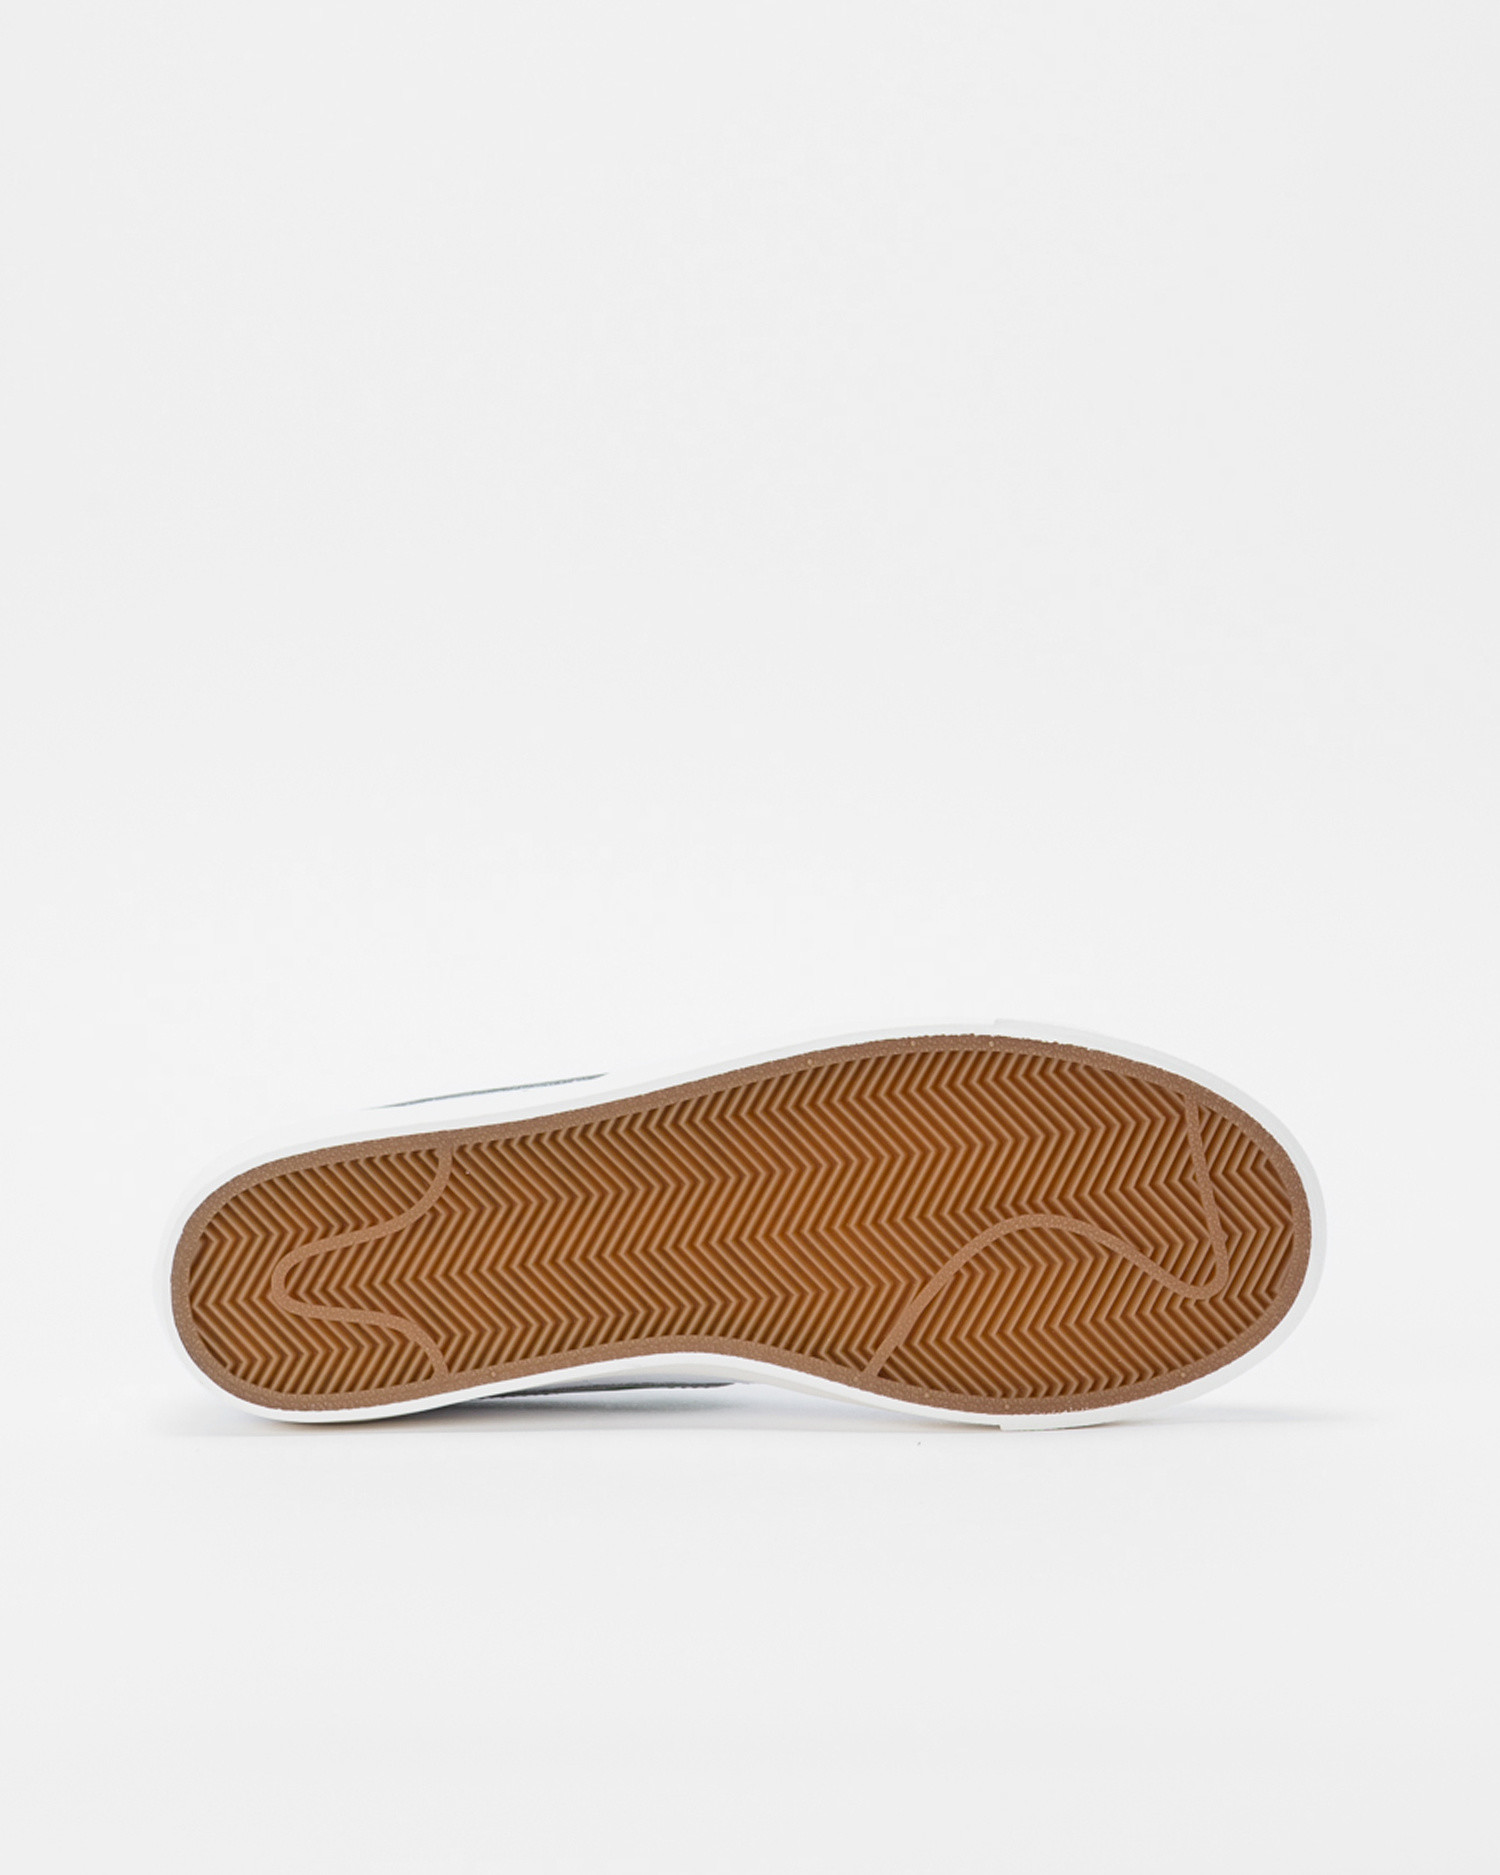 Nike Blazer Low Leather White/Forest Green-Sail